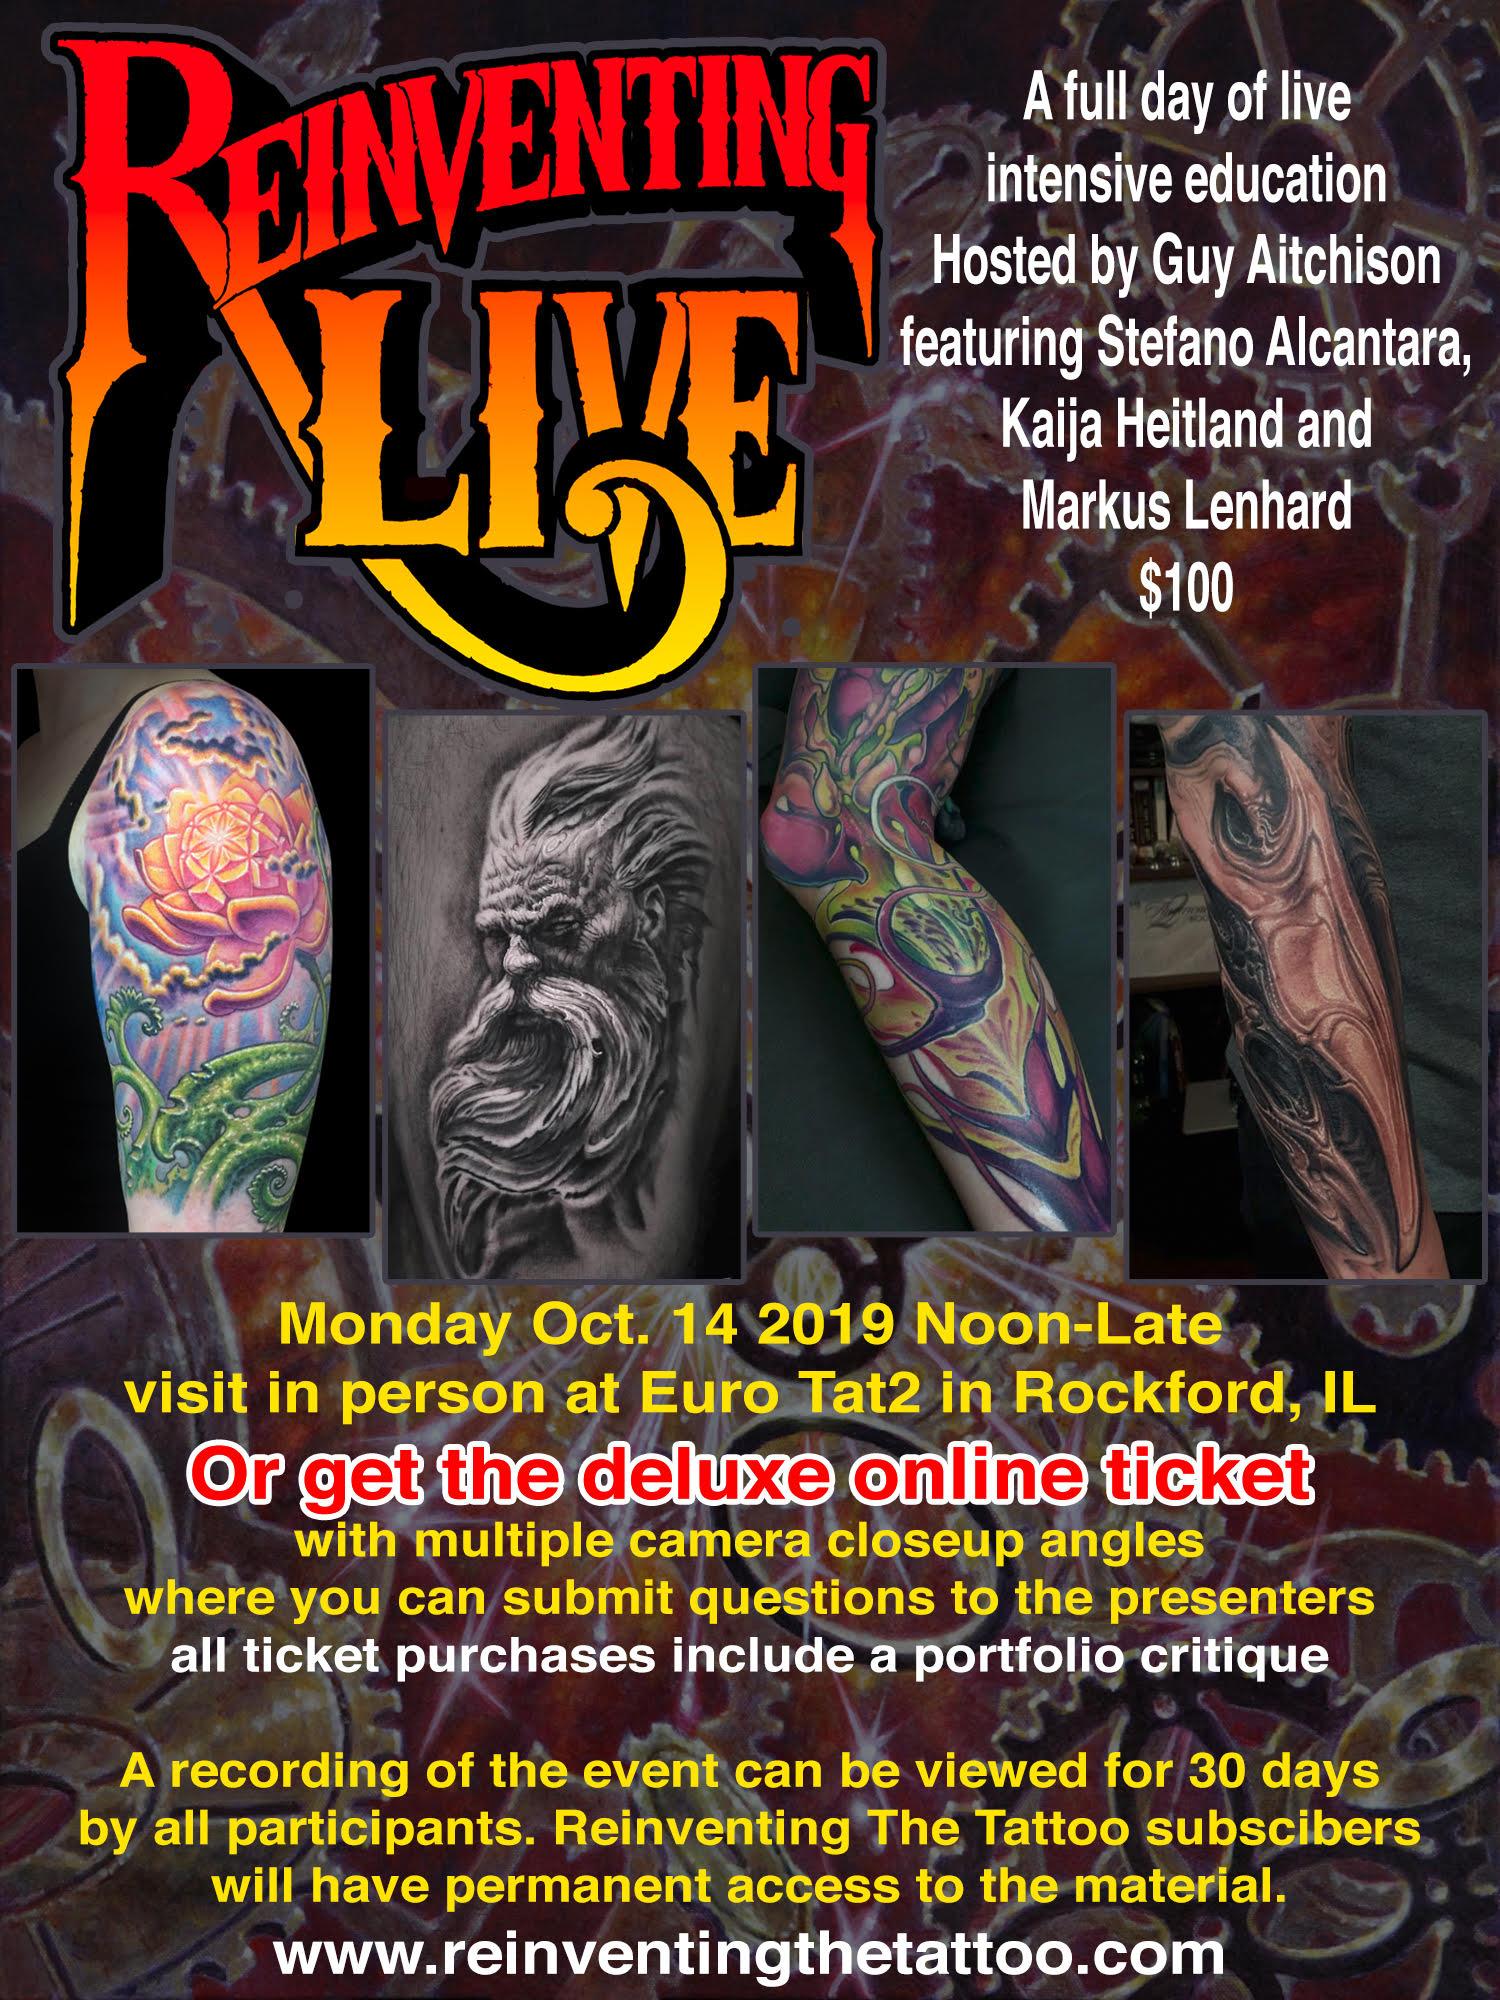 Sailor Jerry Tattoo Art Flash 12 13 X 19 Photo Print Art Art Posters